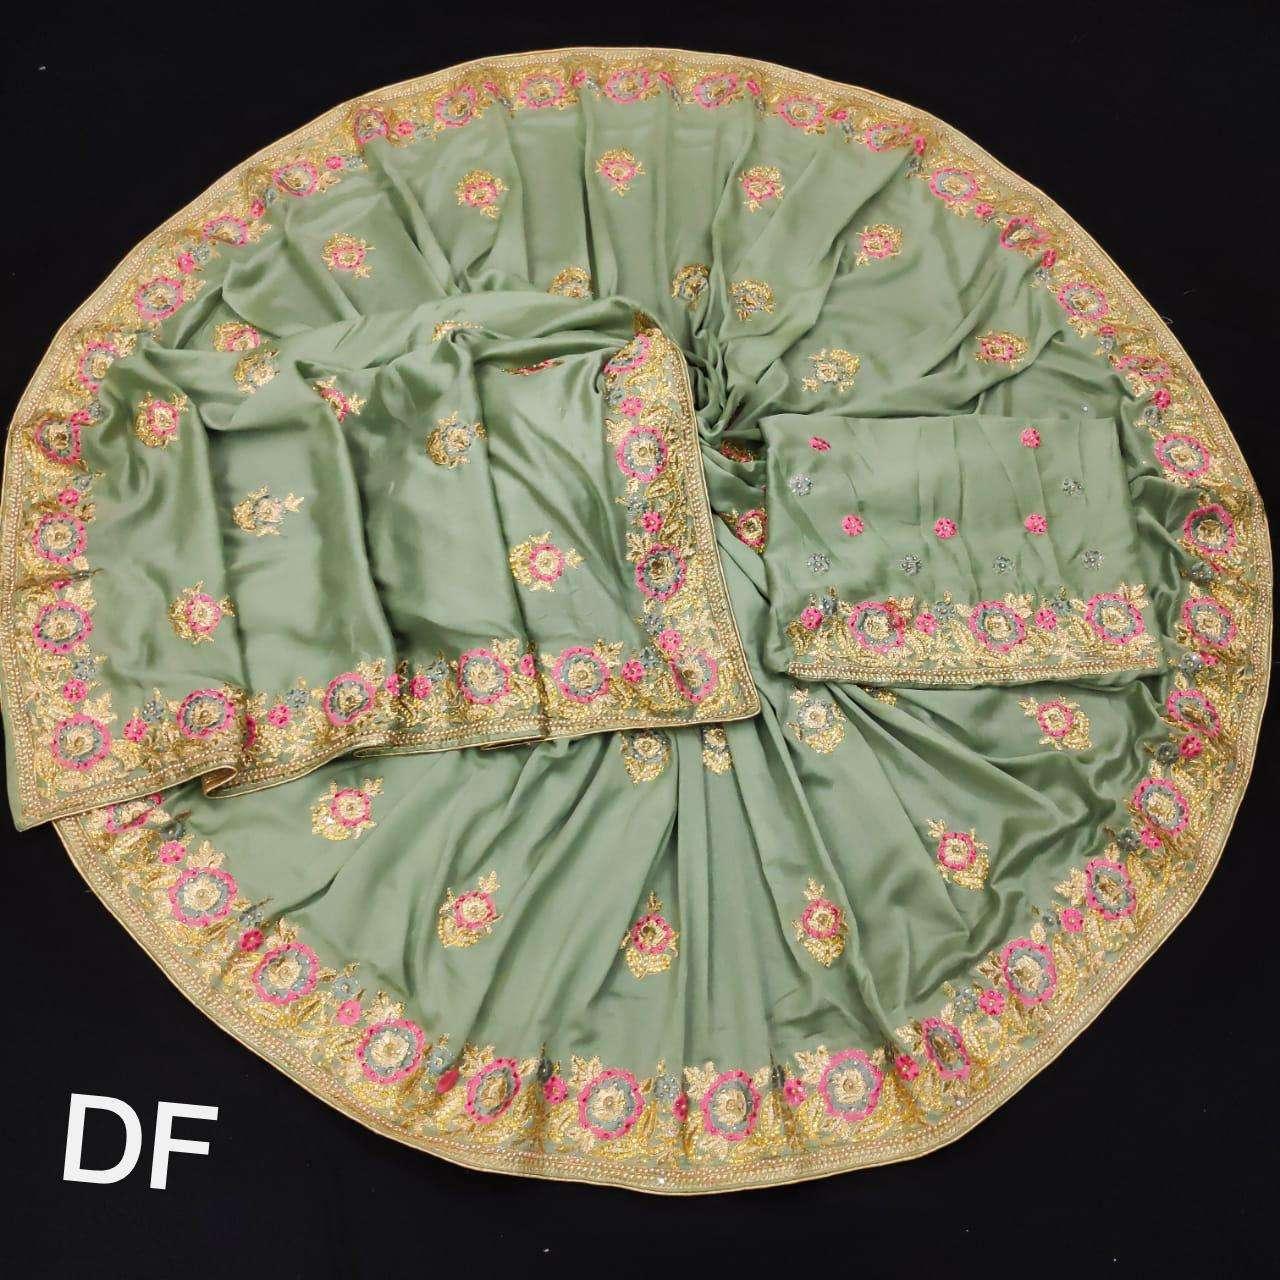 Df 4024 Vichitra Silk Georgette With Multi Embroidery Zari Work Sarees Collection 06